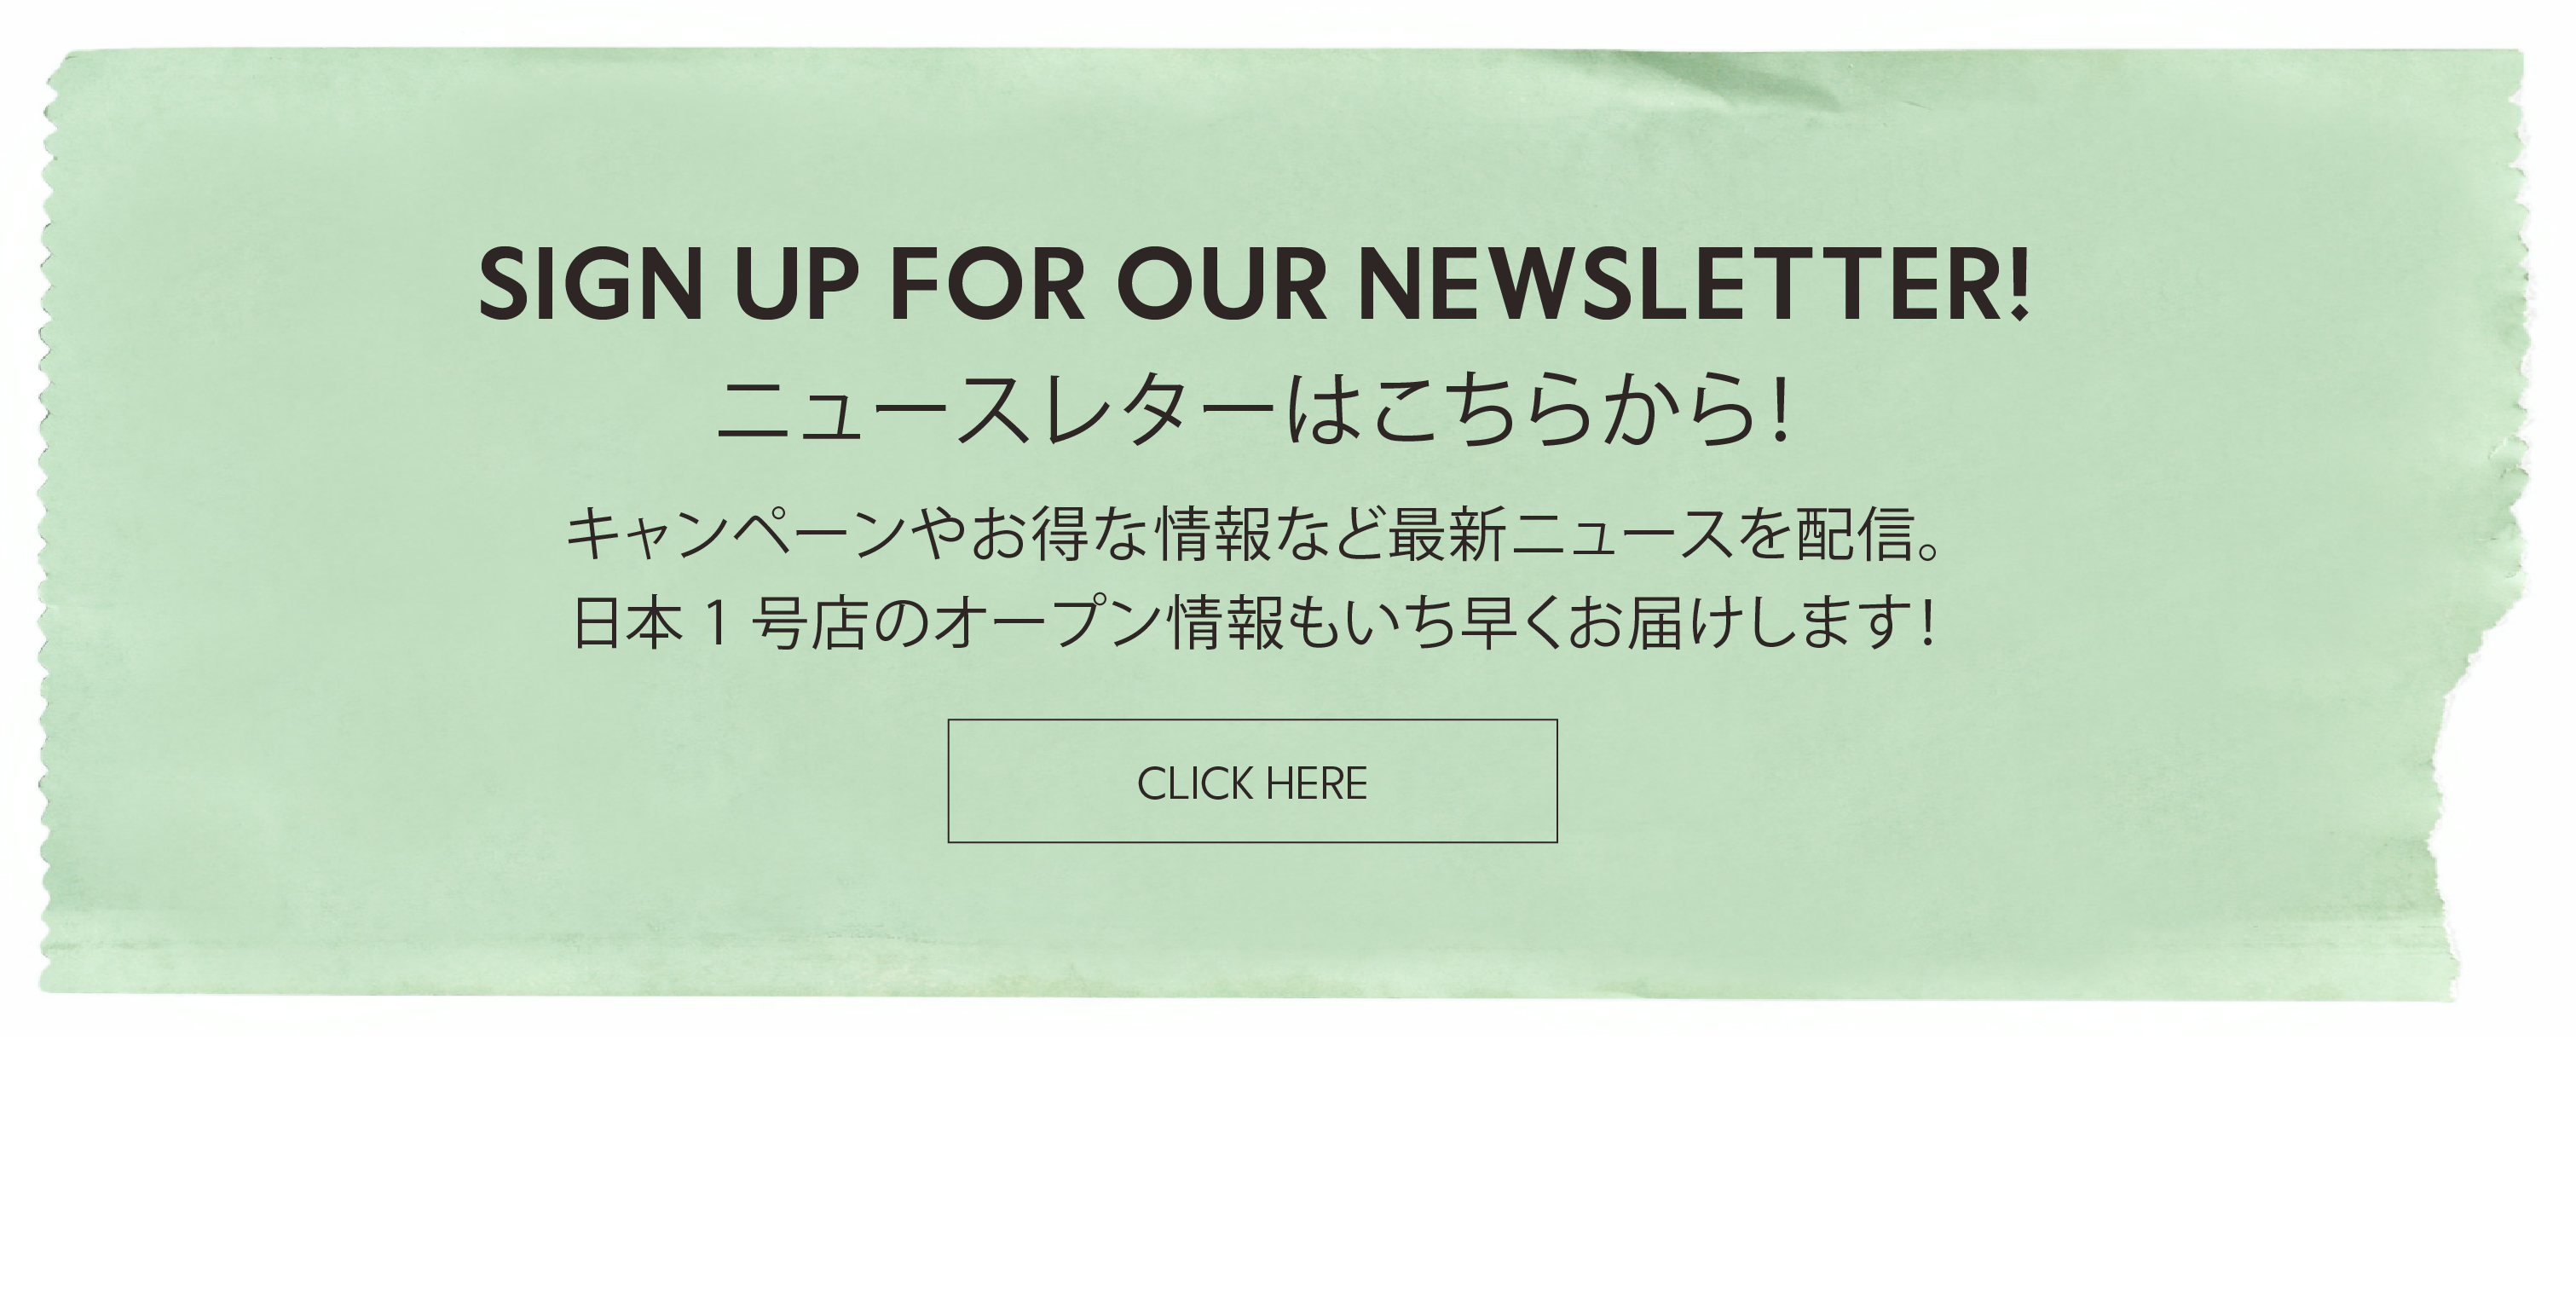 news letter click